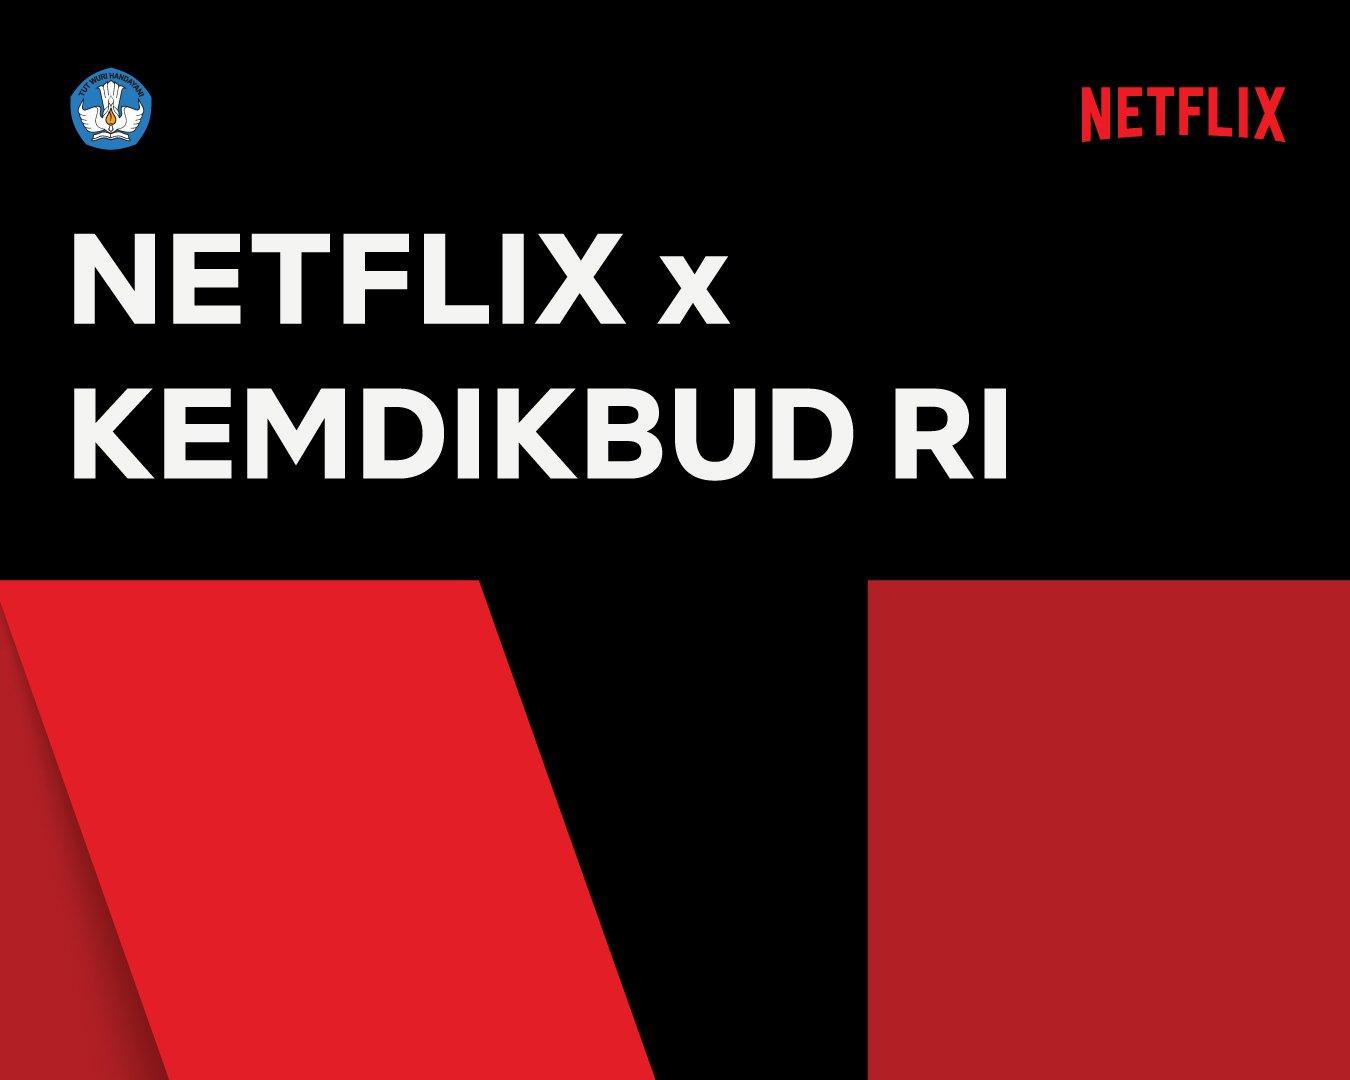 Netflix dan Kemendikbud Kerja Sama, Tayangan Edukatif Netflix akan Hadir di TVRI